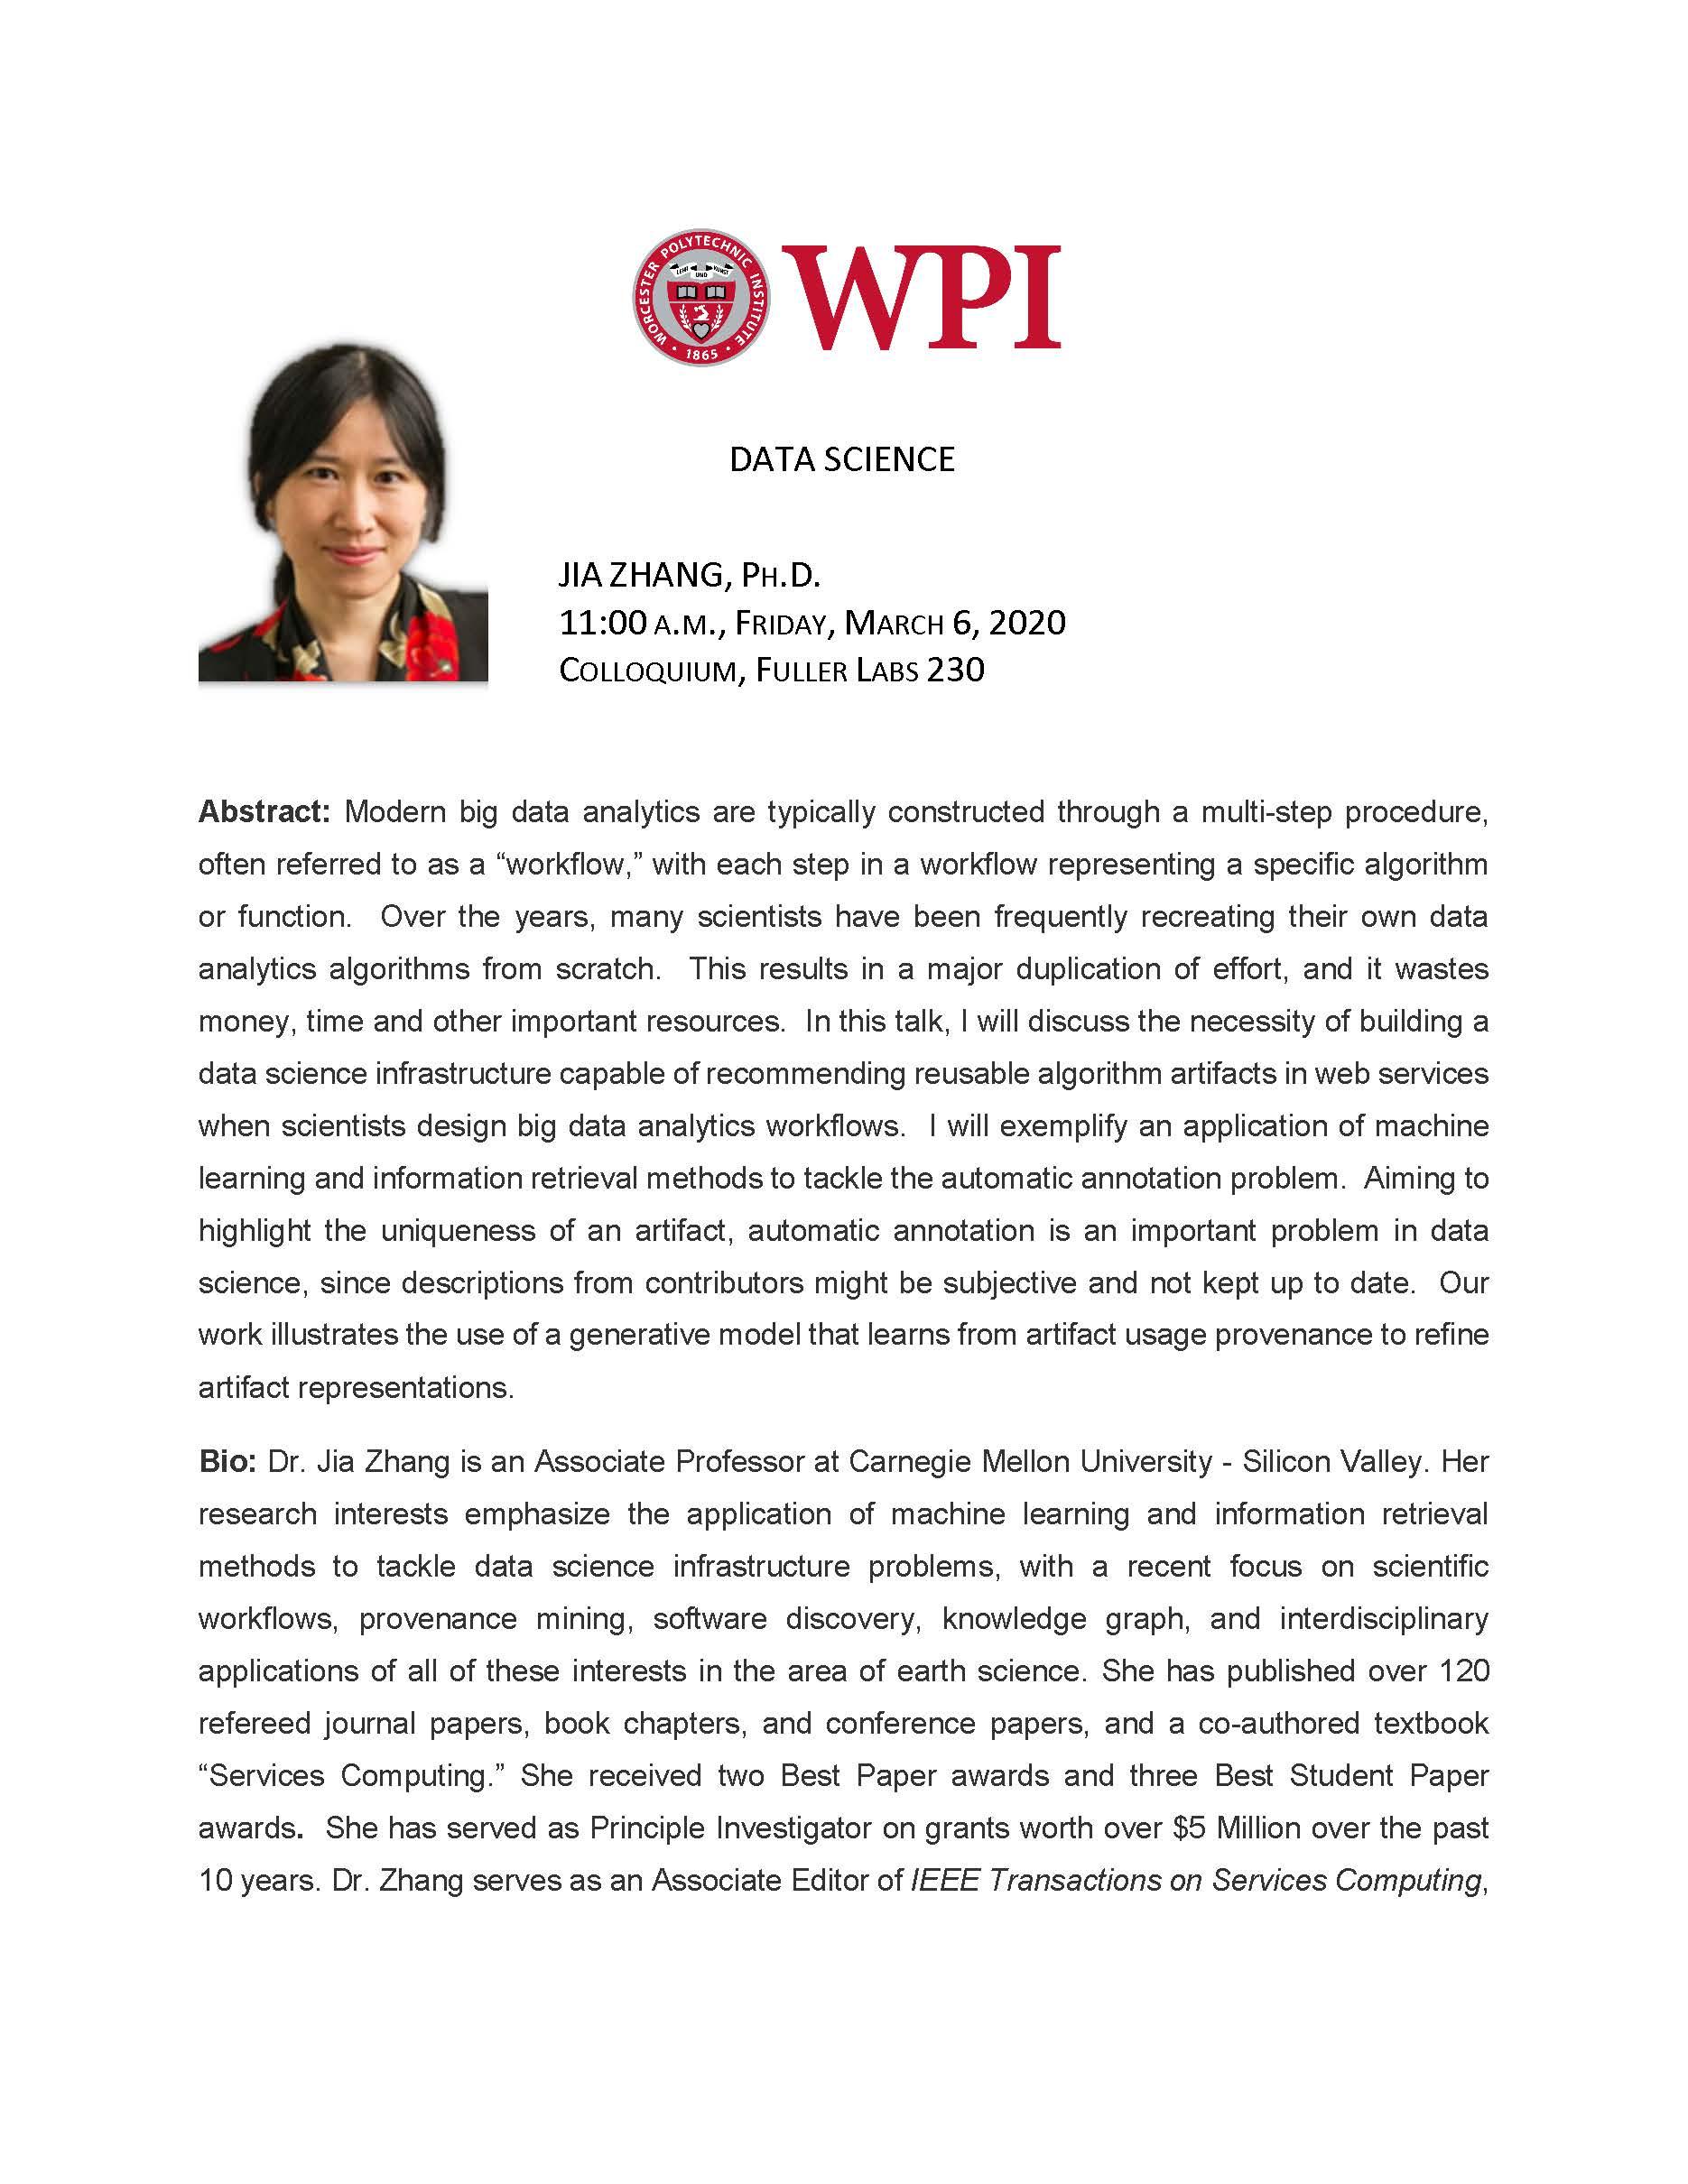 Jia Zhang, Ph.D. alt